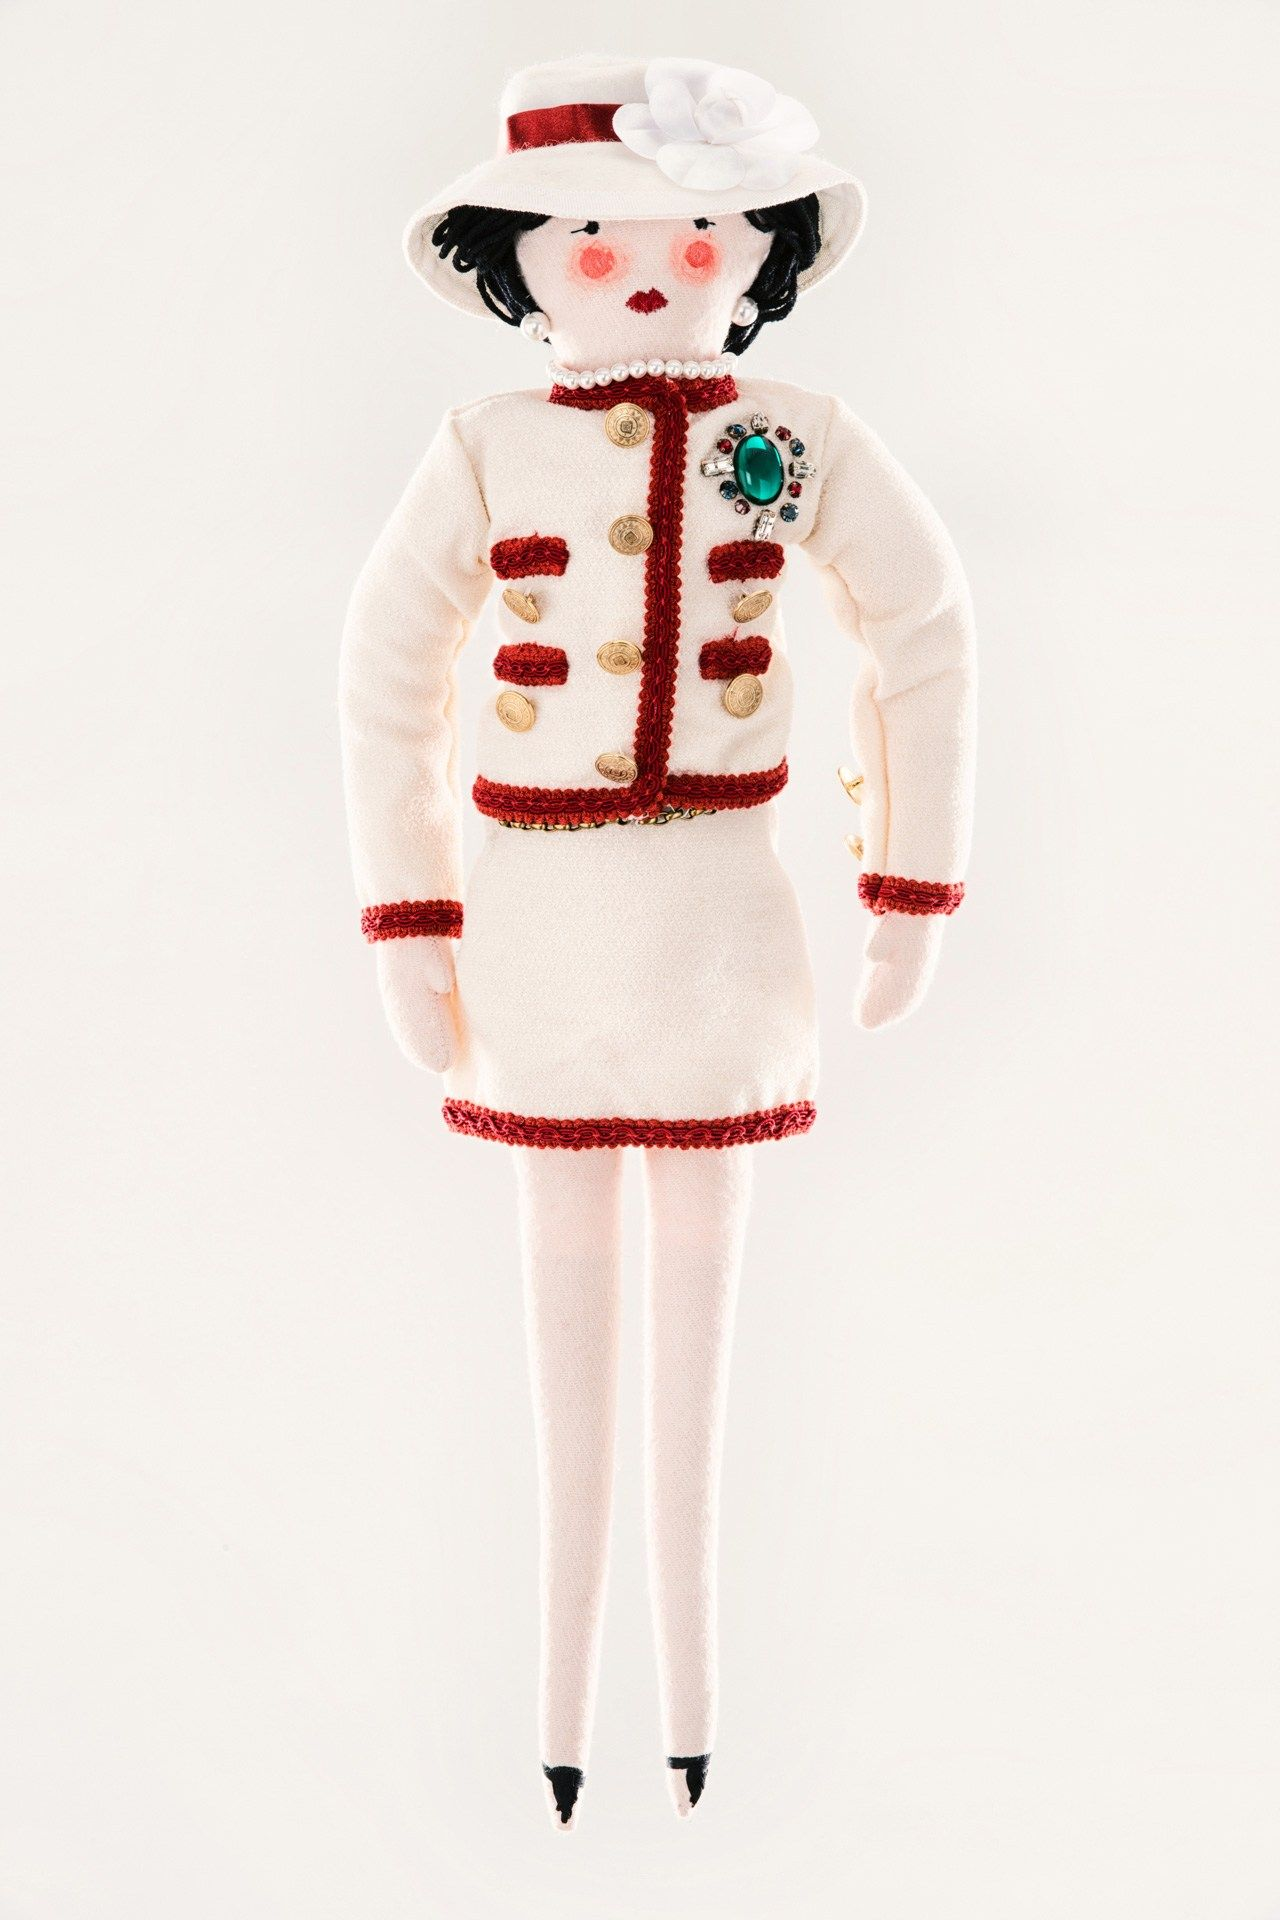 Meet The World's Most Stylish Dolls